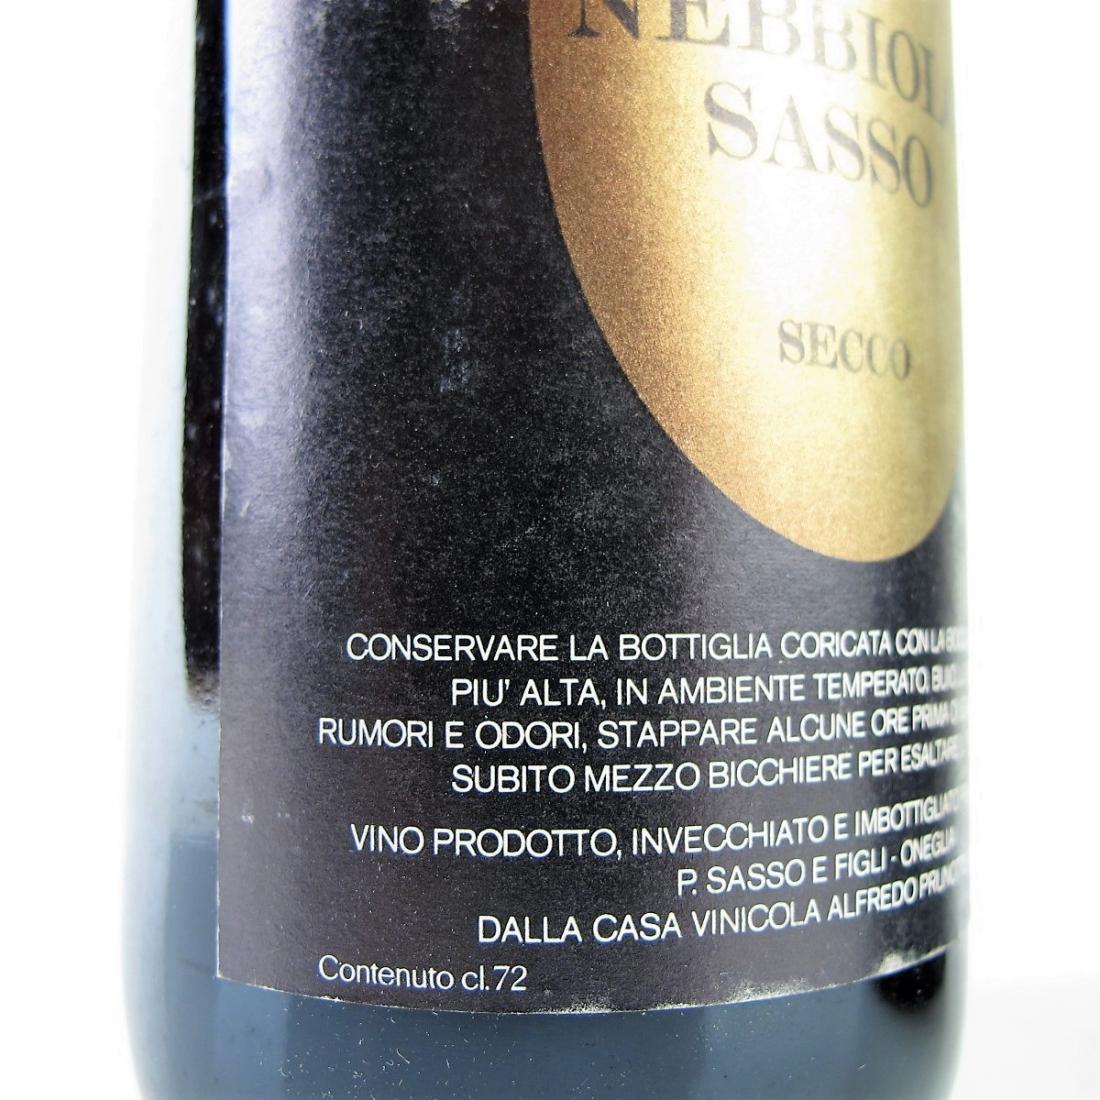 Prunotto 1972 Nebbiolo 2x75cl